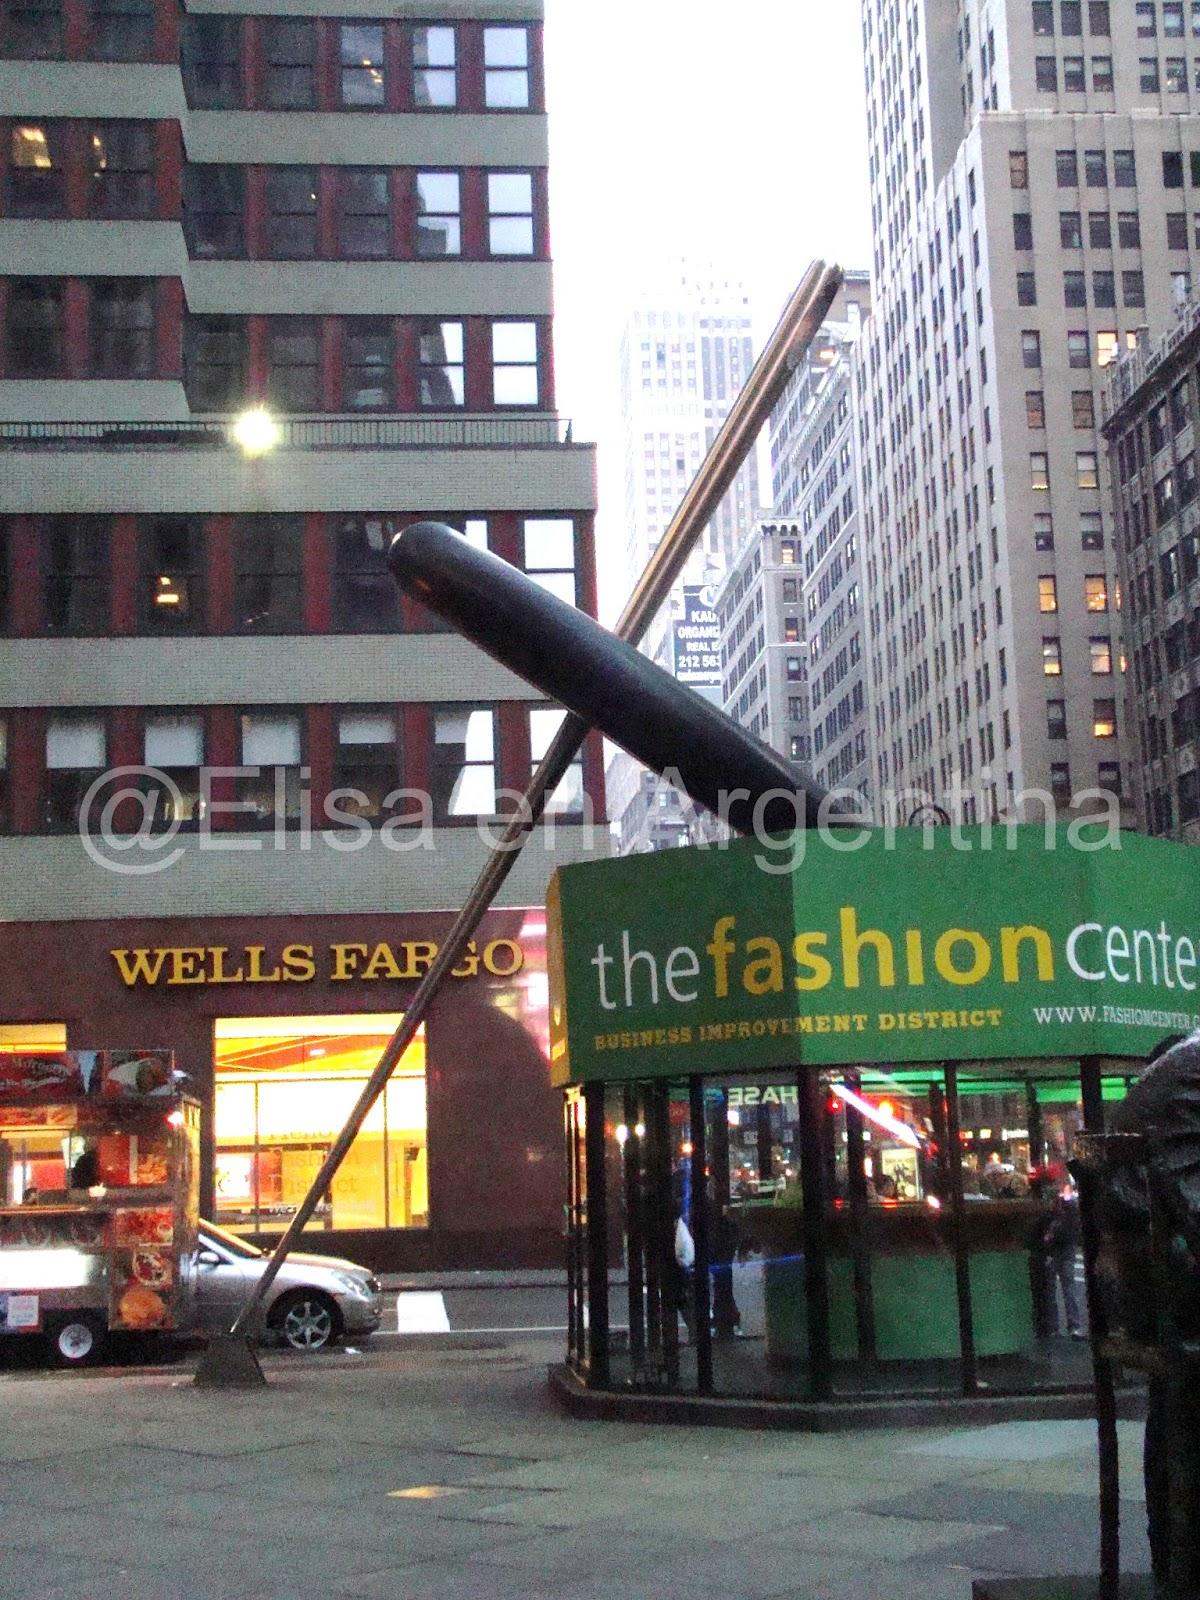 Garment District, New York, Elisa N, Blog de Viajes, Lifestyle, Travel